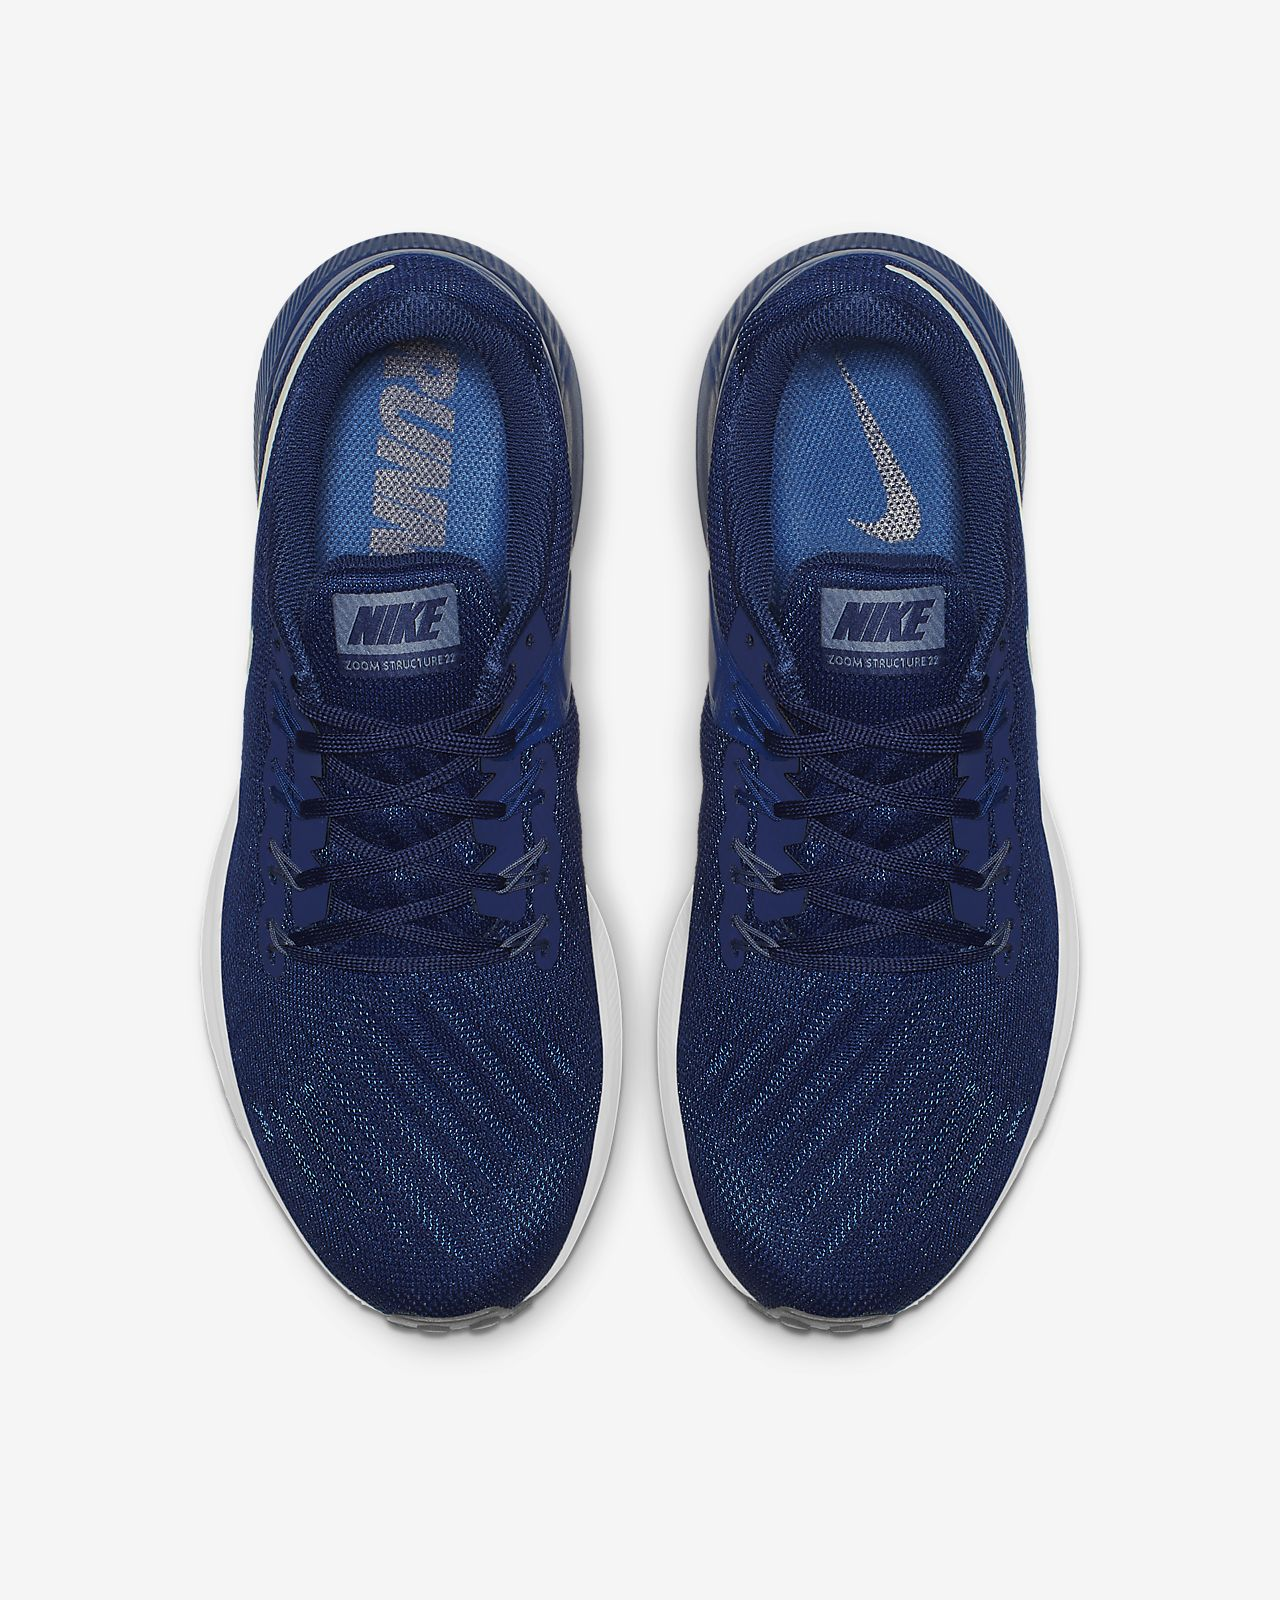 Chaussure de running Nike Air Zoom Structure 22 pour Homme (étroite)